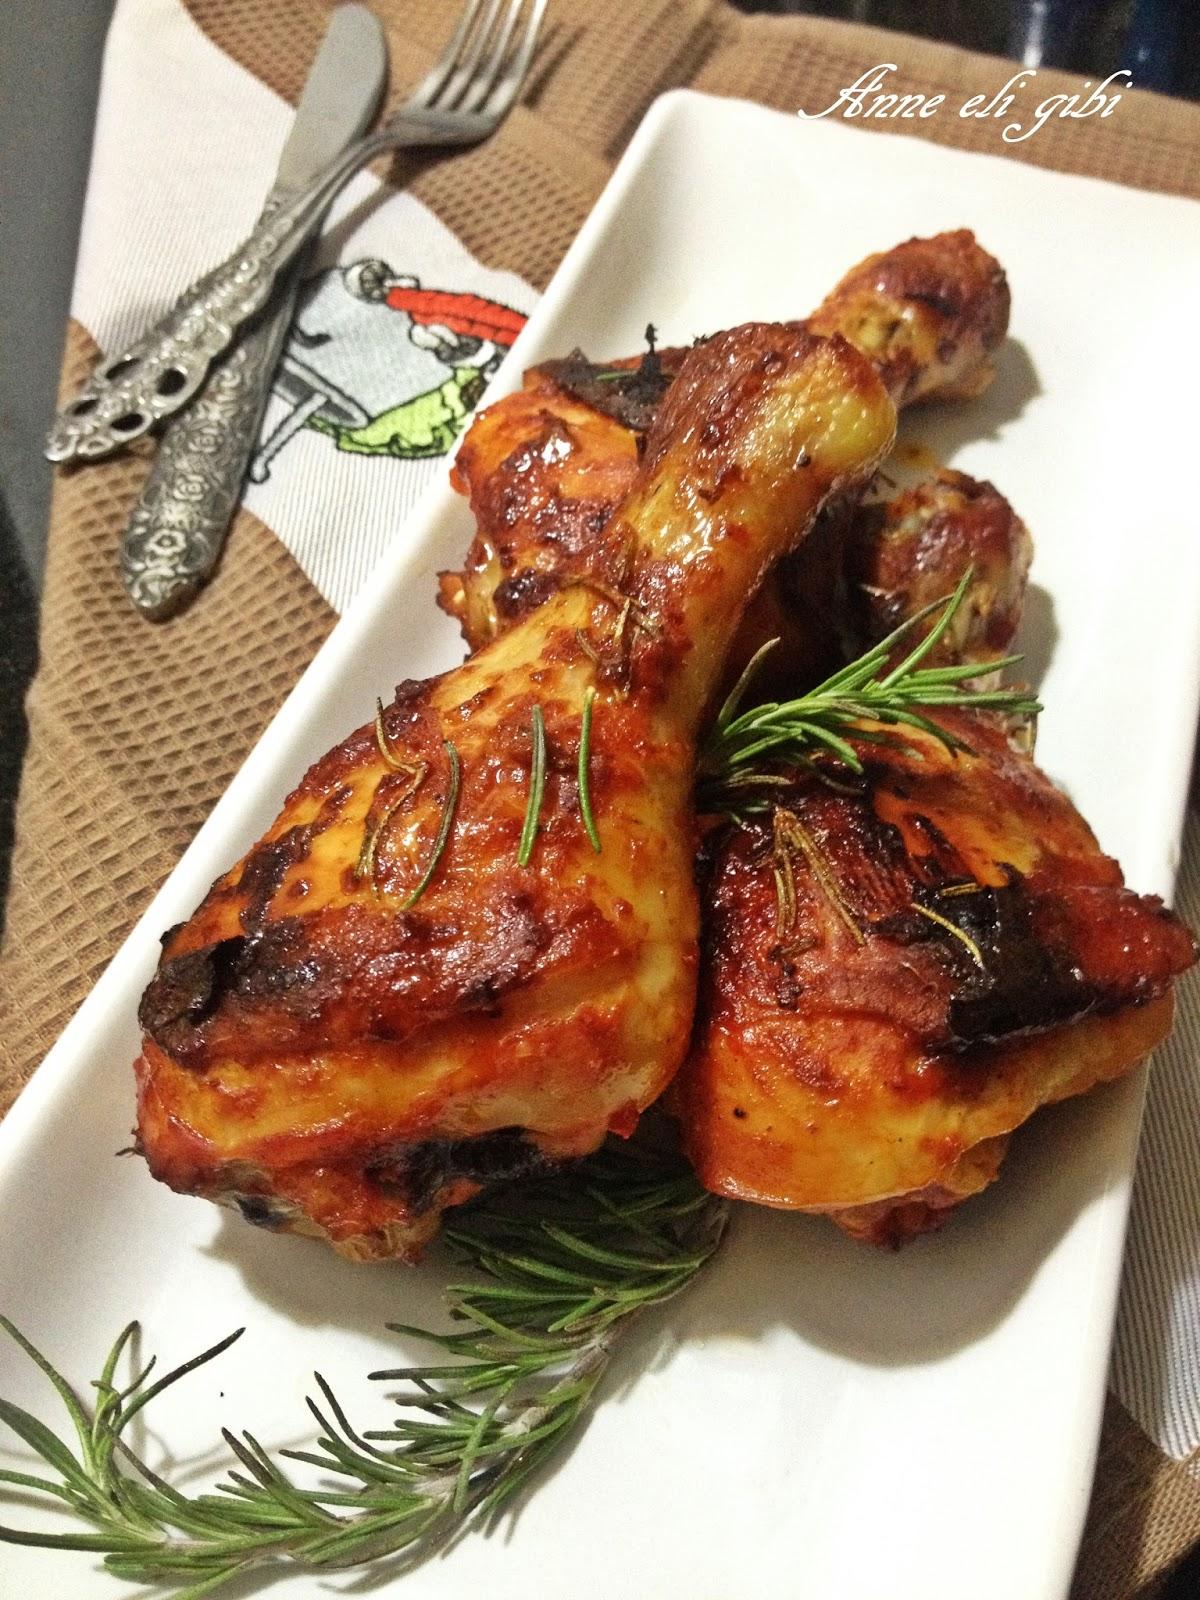 Fırında Tavuk Baget Videosu 23